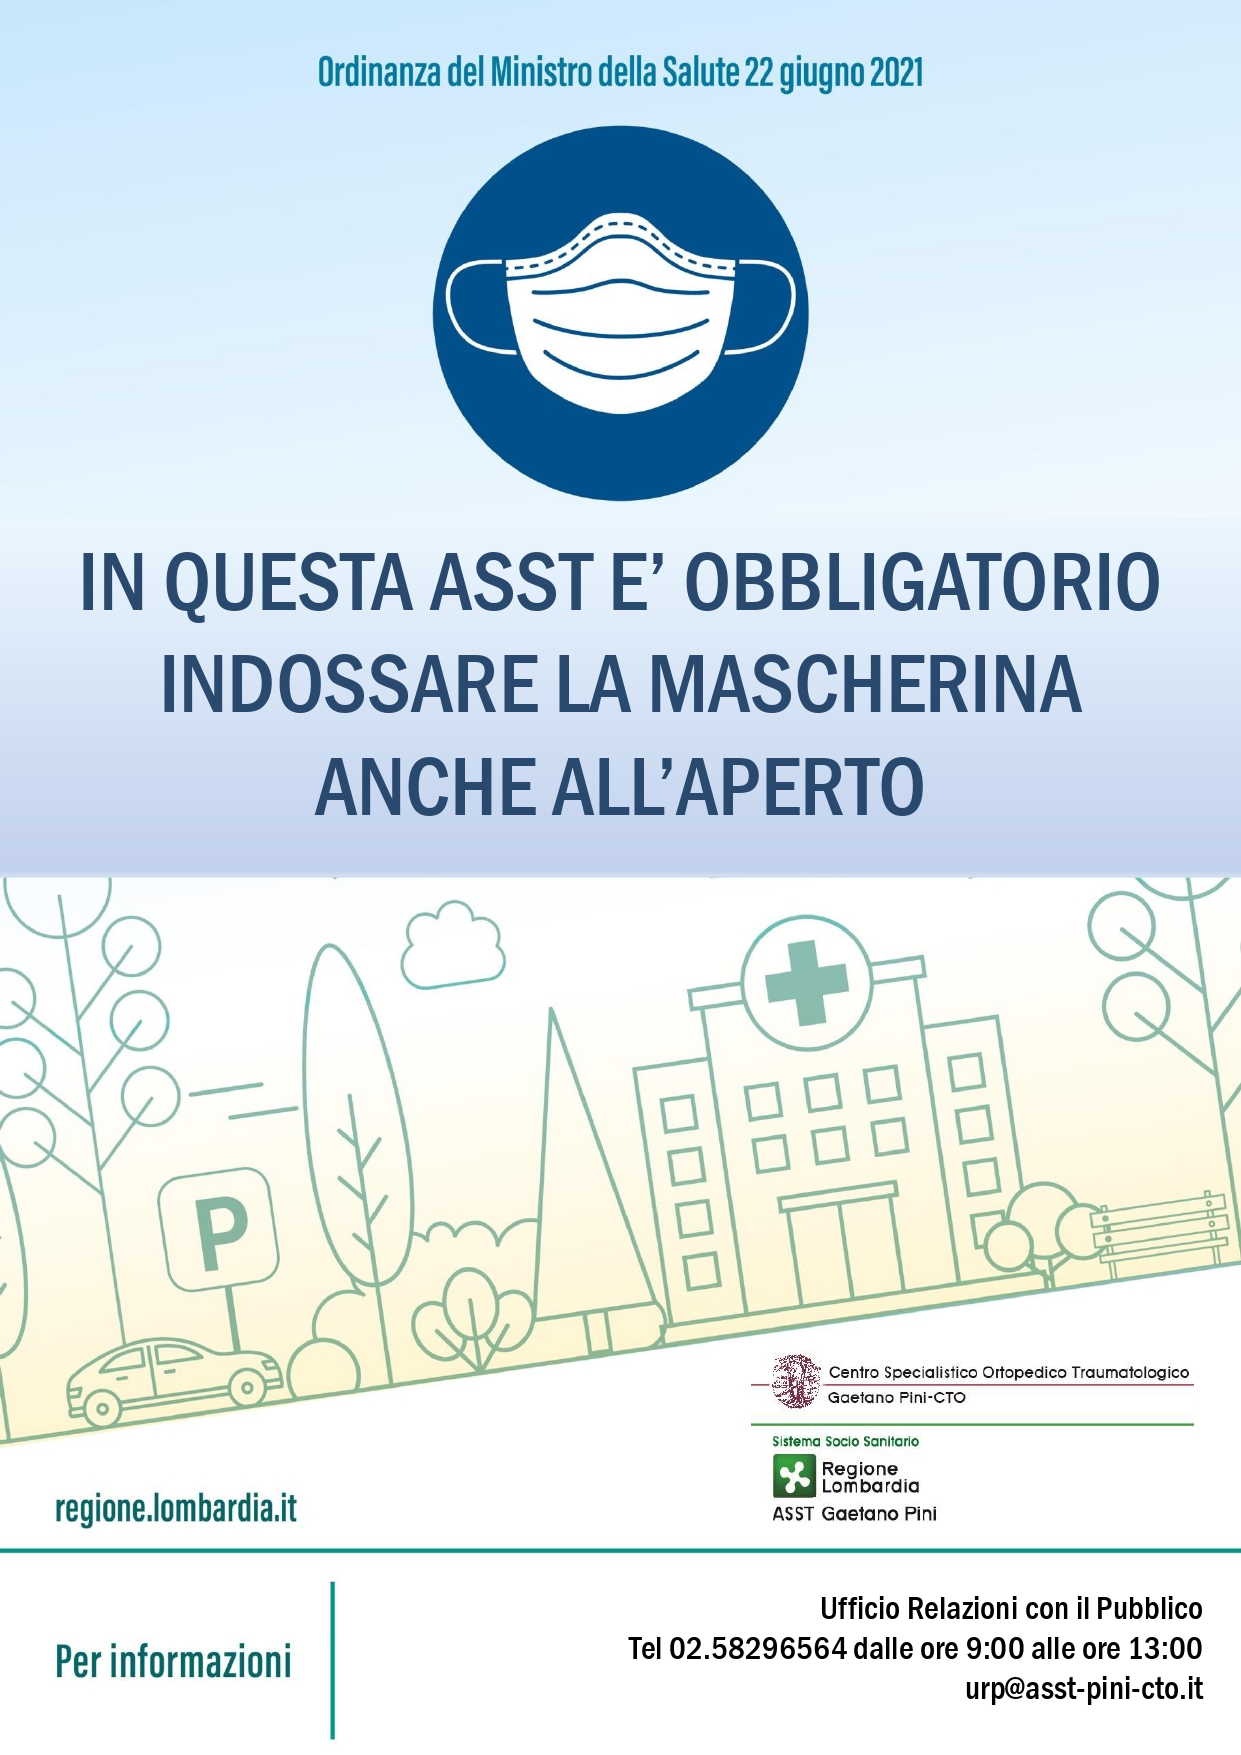 Obbligo mascherina_A3 con logo ASST Pini-CTO verticale_rev2_pages-to-jpg-0001.jpg